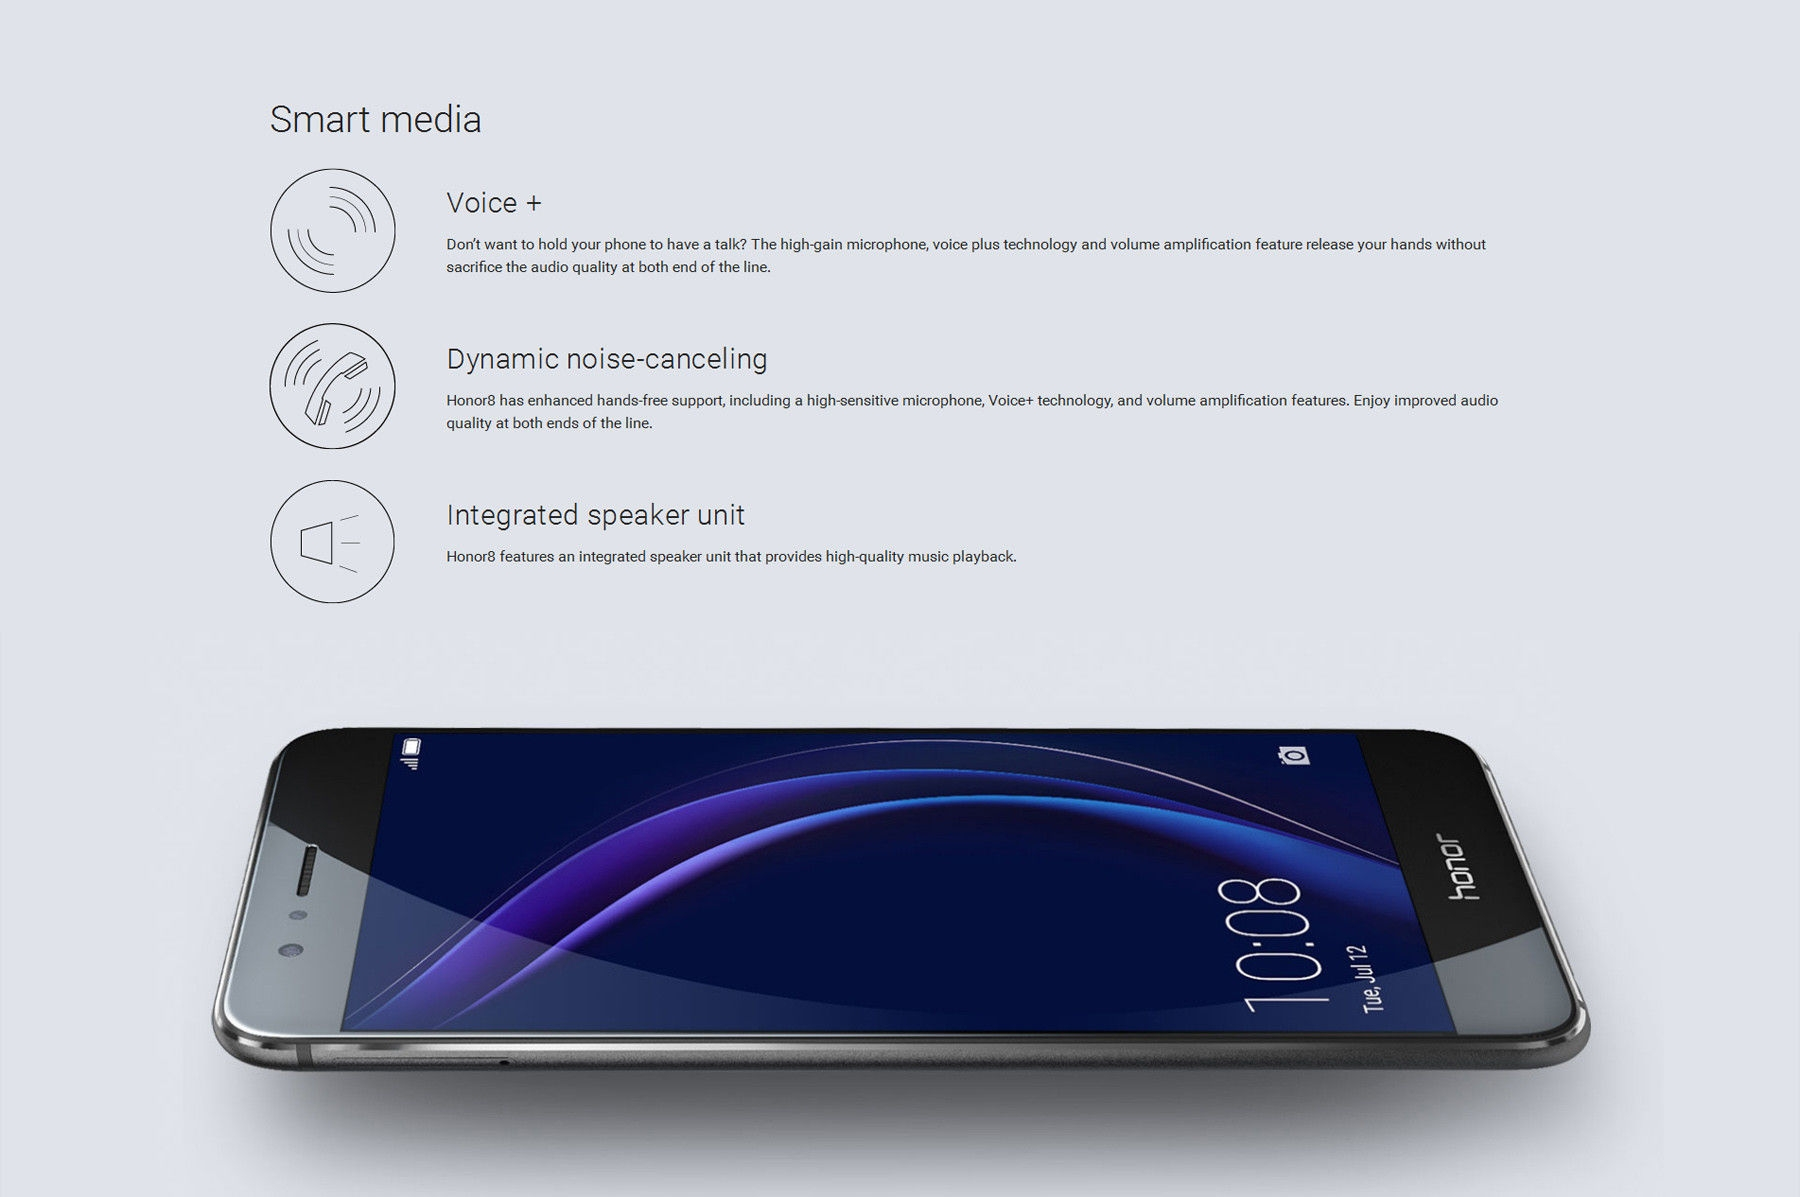 Huawei Honor 8 FRD-AL00 Android 6.0 5.2 inch 4G Smartphone Kirin 950 Octa Core 2.3GHz 4GB RAM 32GB ROM Fingerprint Scanner NFC Double 2.5D Arc Glass